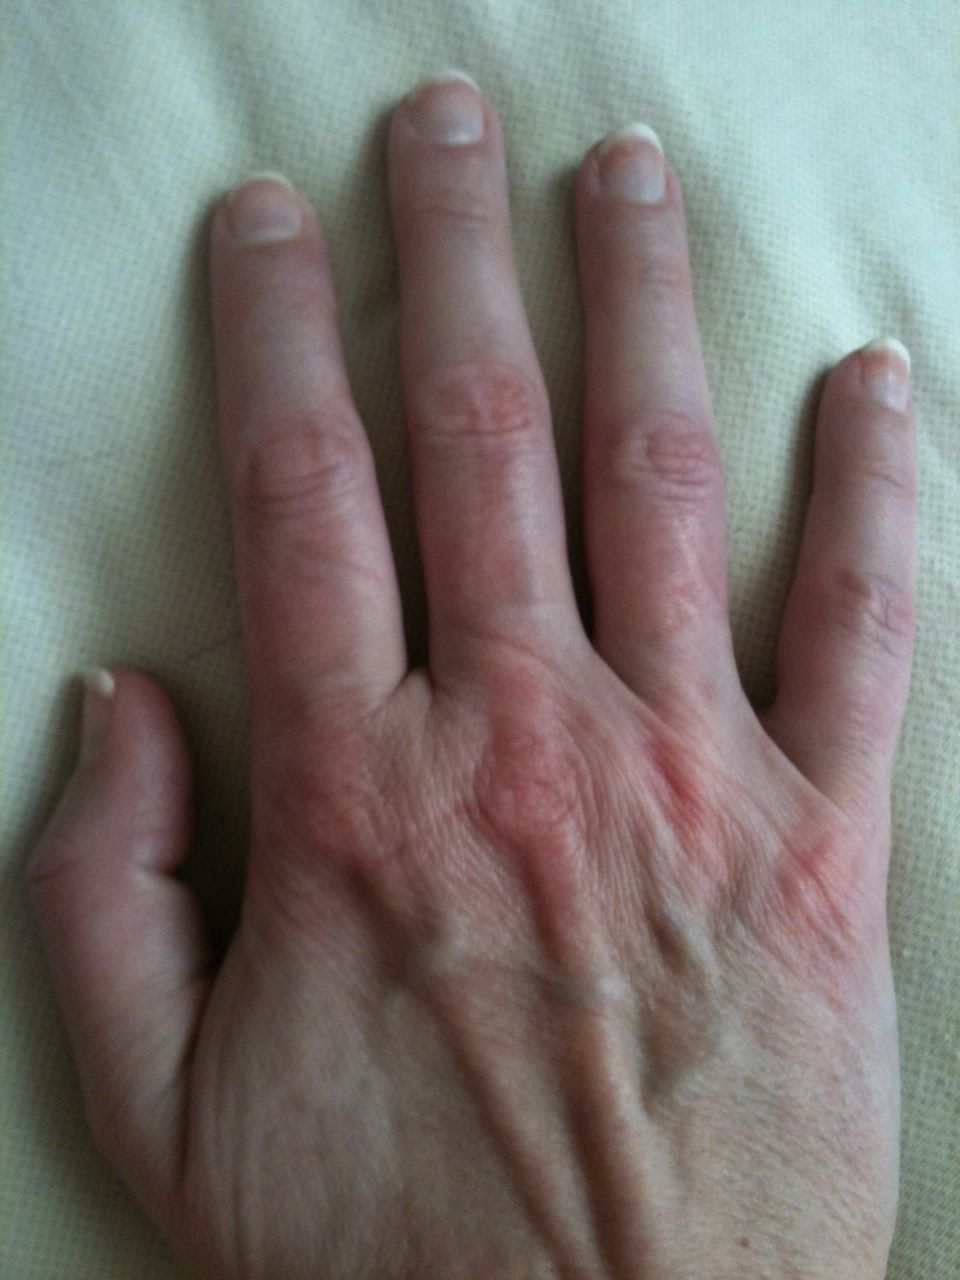 Lupus hands   life with lupus   Pinterest   Autoimmune disease and ...